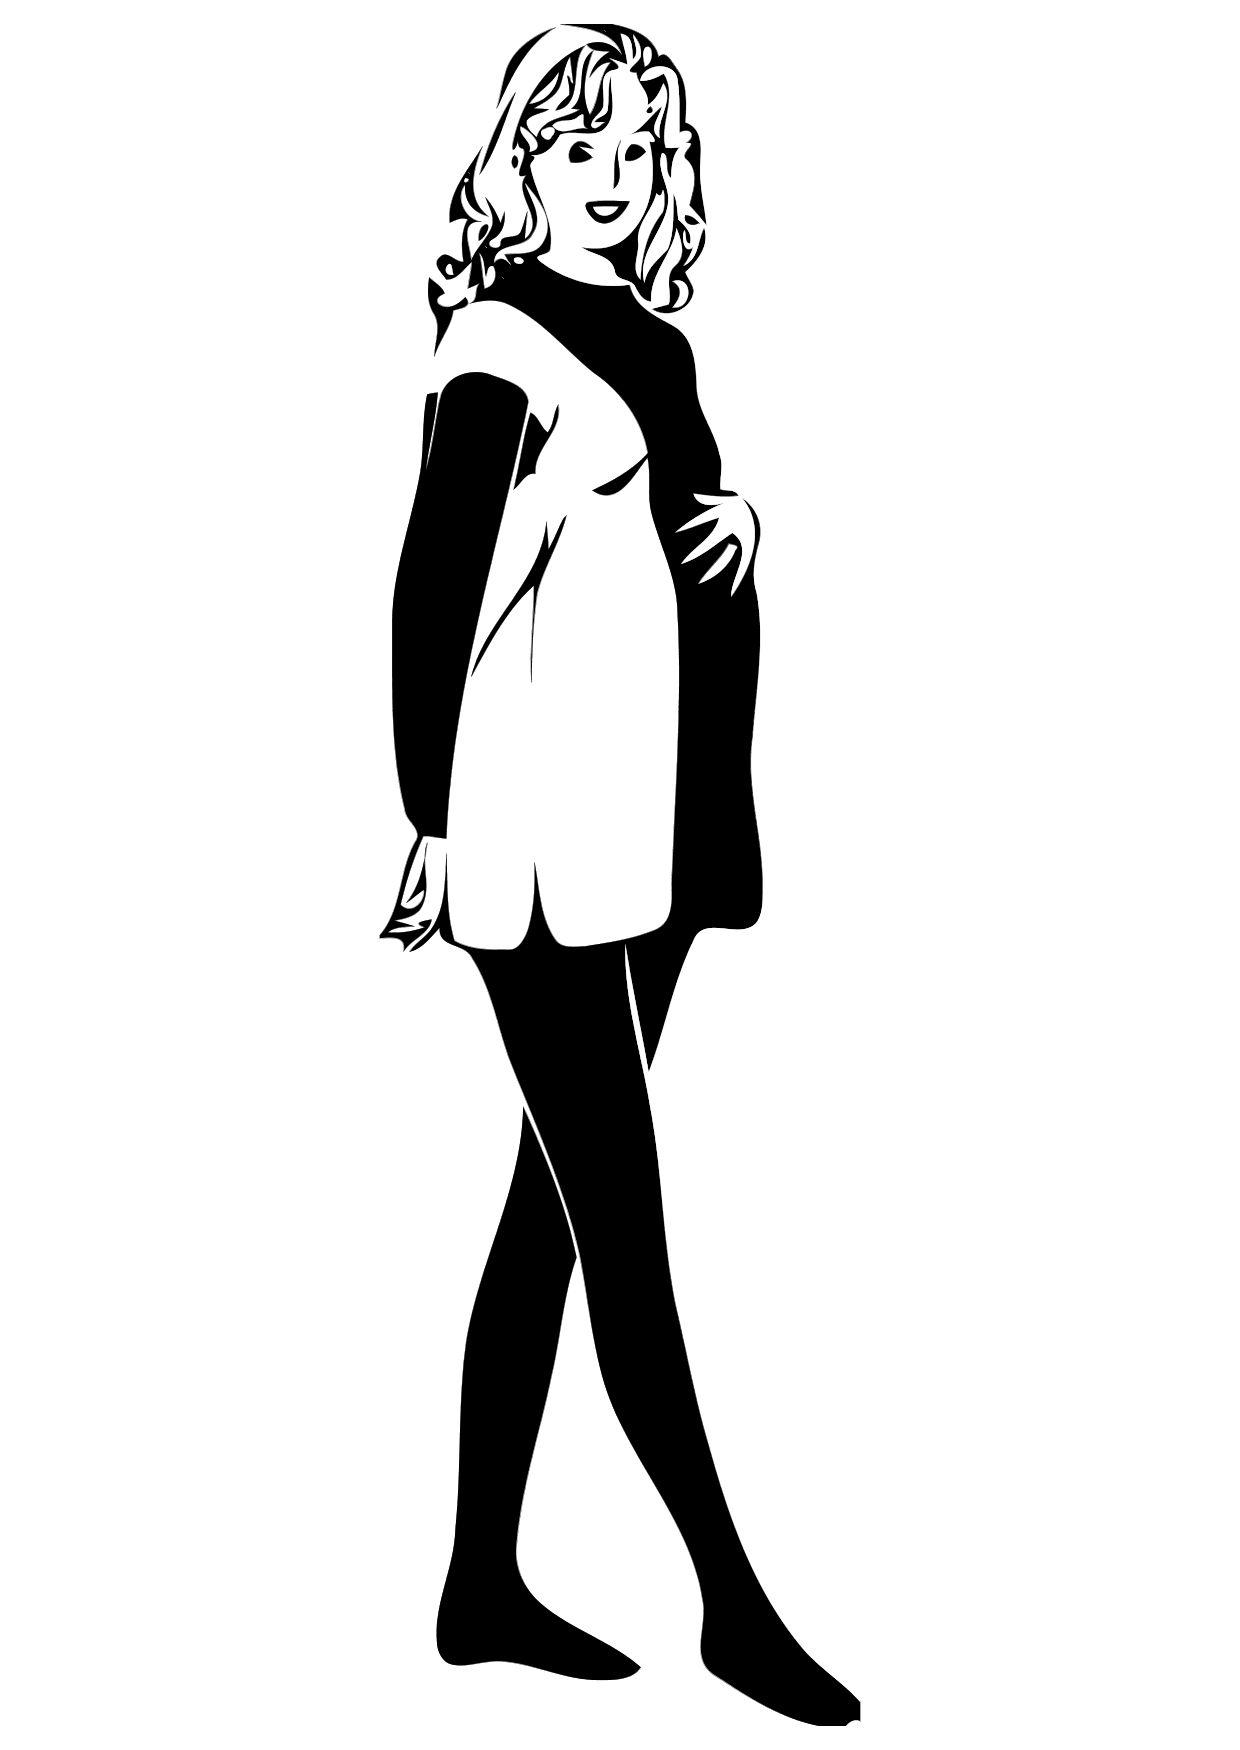 Dibujo Para Colorear Mujer Embarazada Img 11375 Images